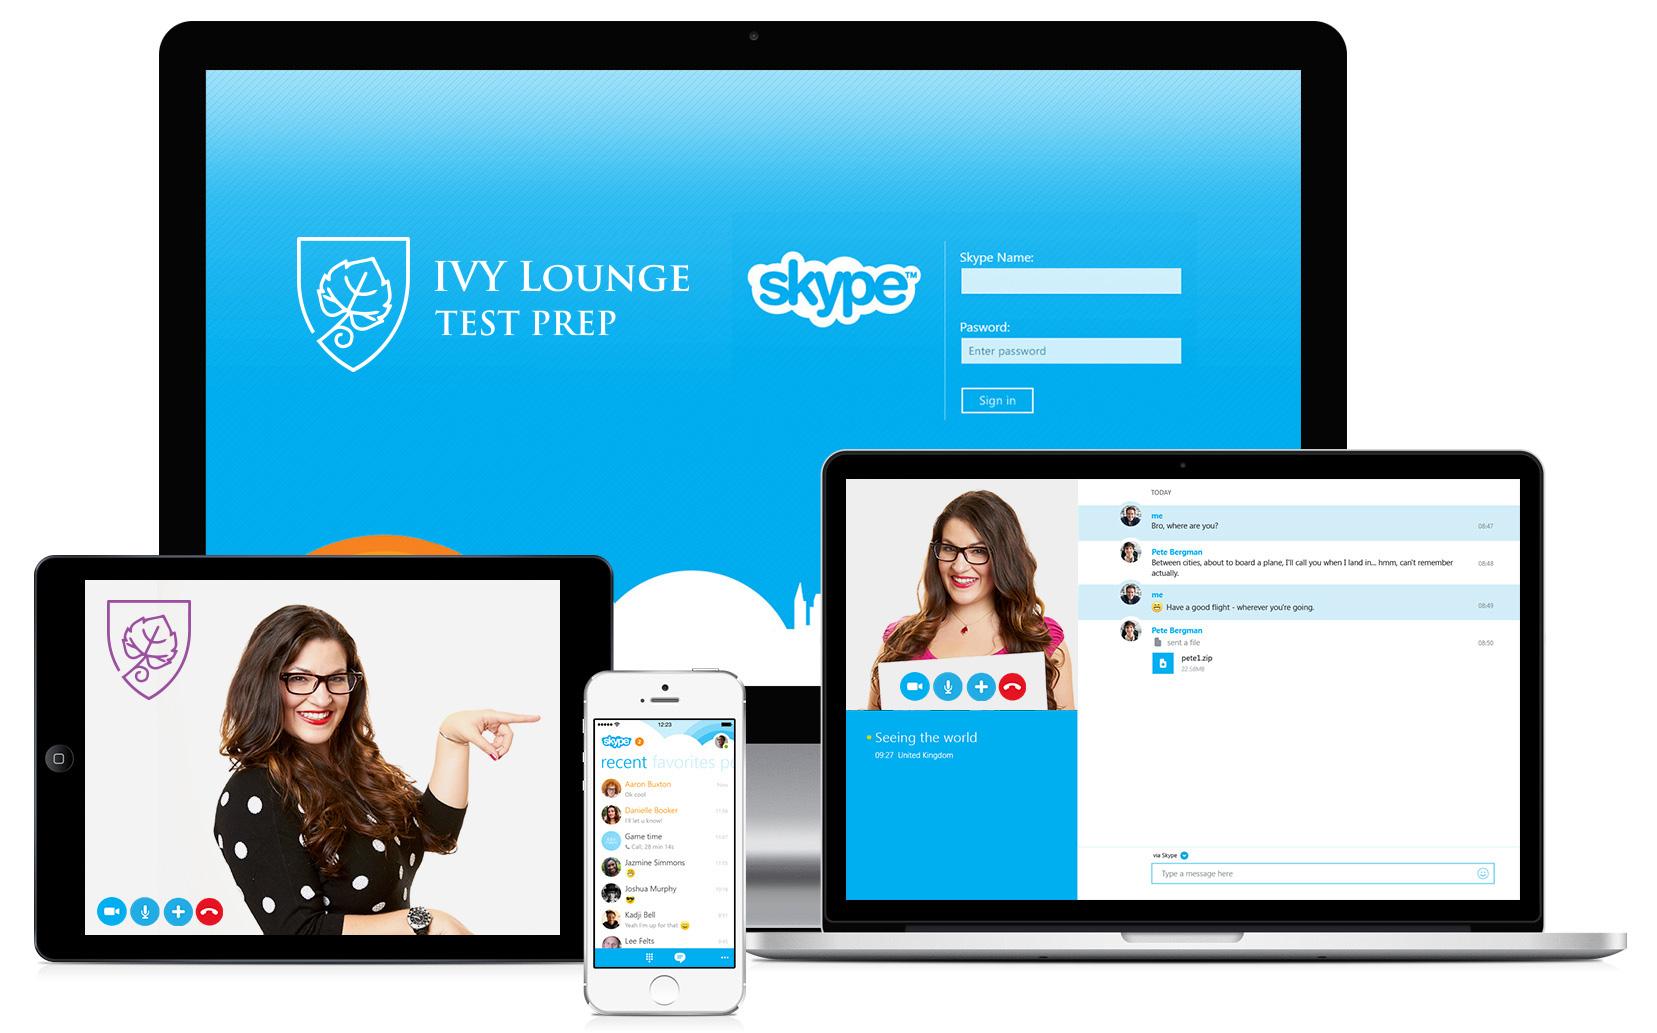 skype-5-8.jpg